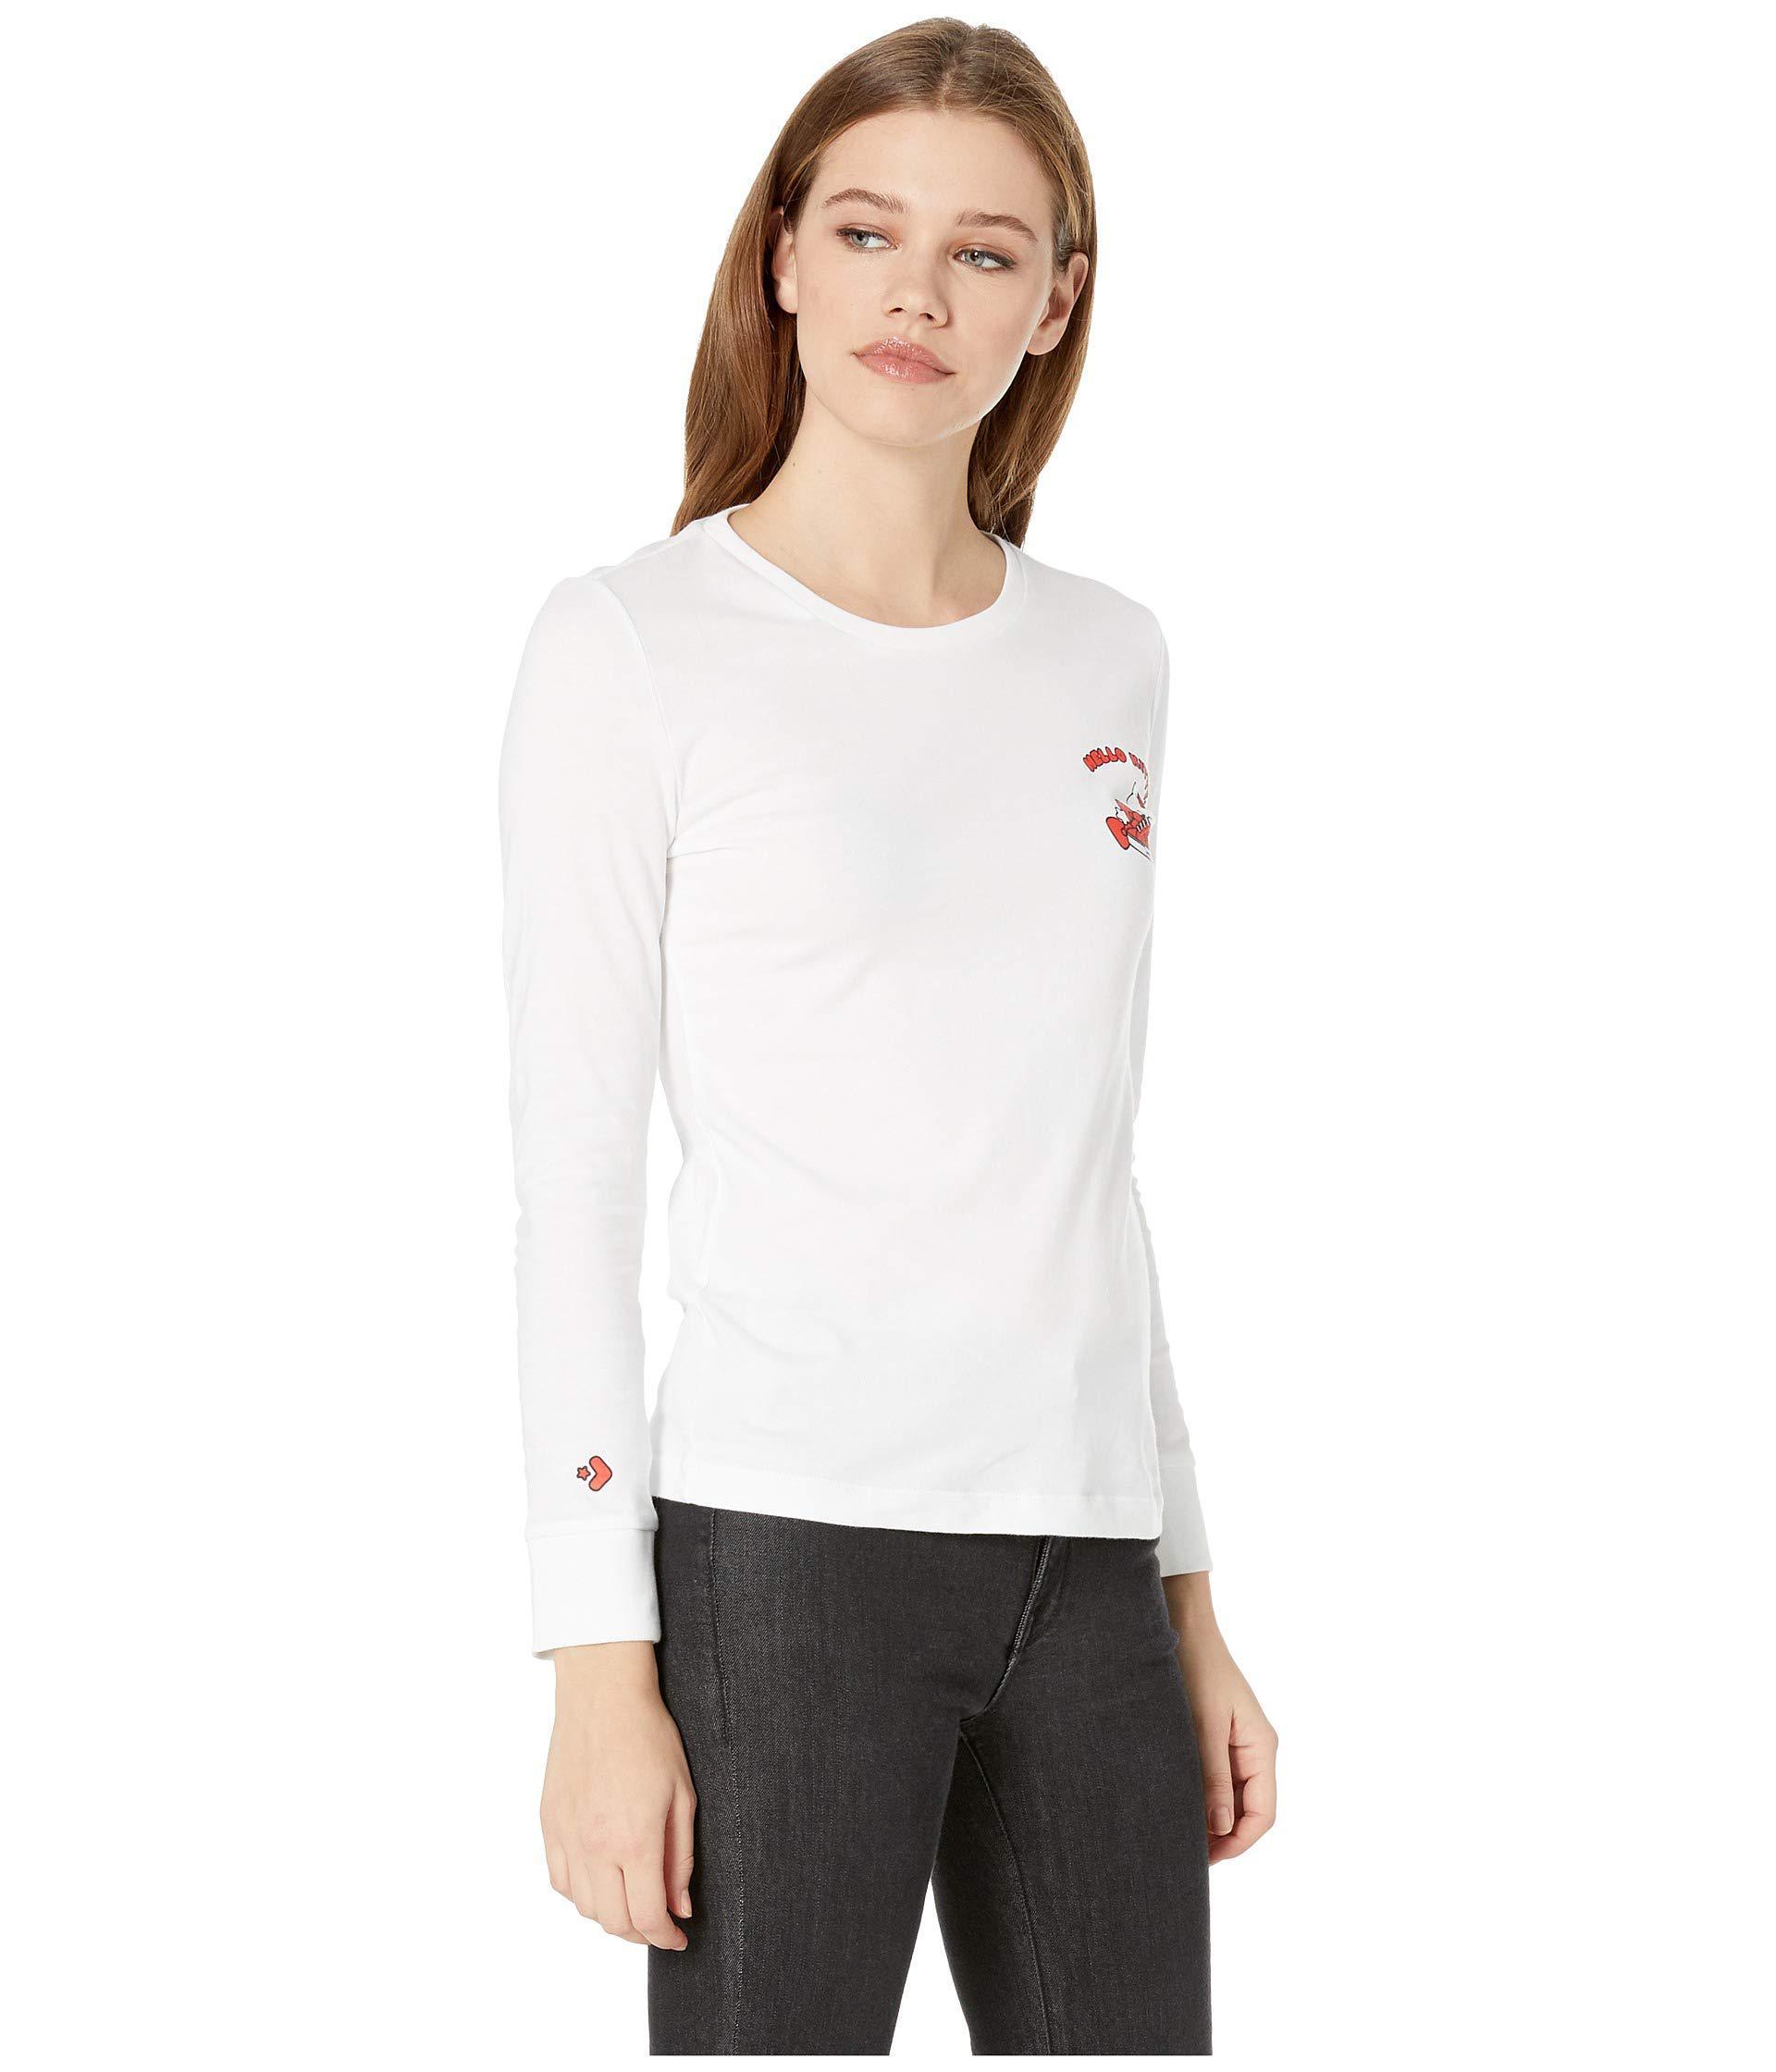 2469814c Converse - X Hello Kitty Long Sleeve Shoe Pile Tee (white) Women's T Shirt.  View fullscreen